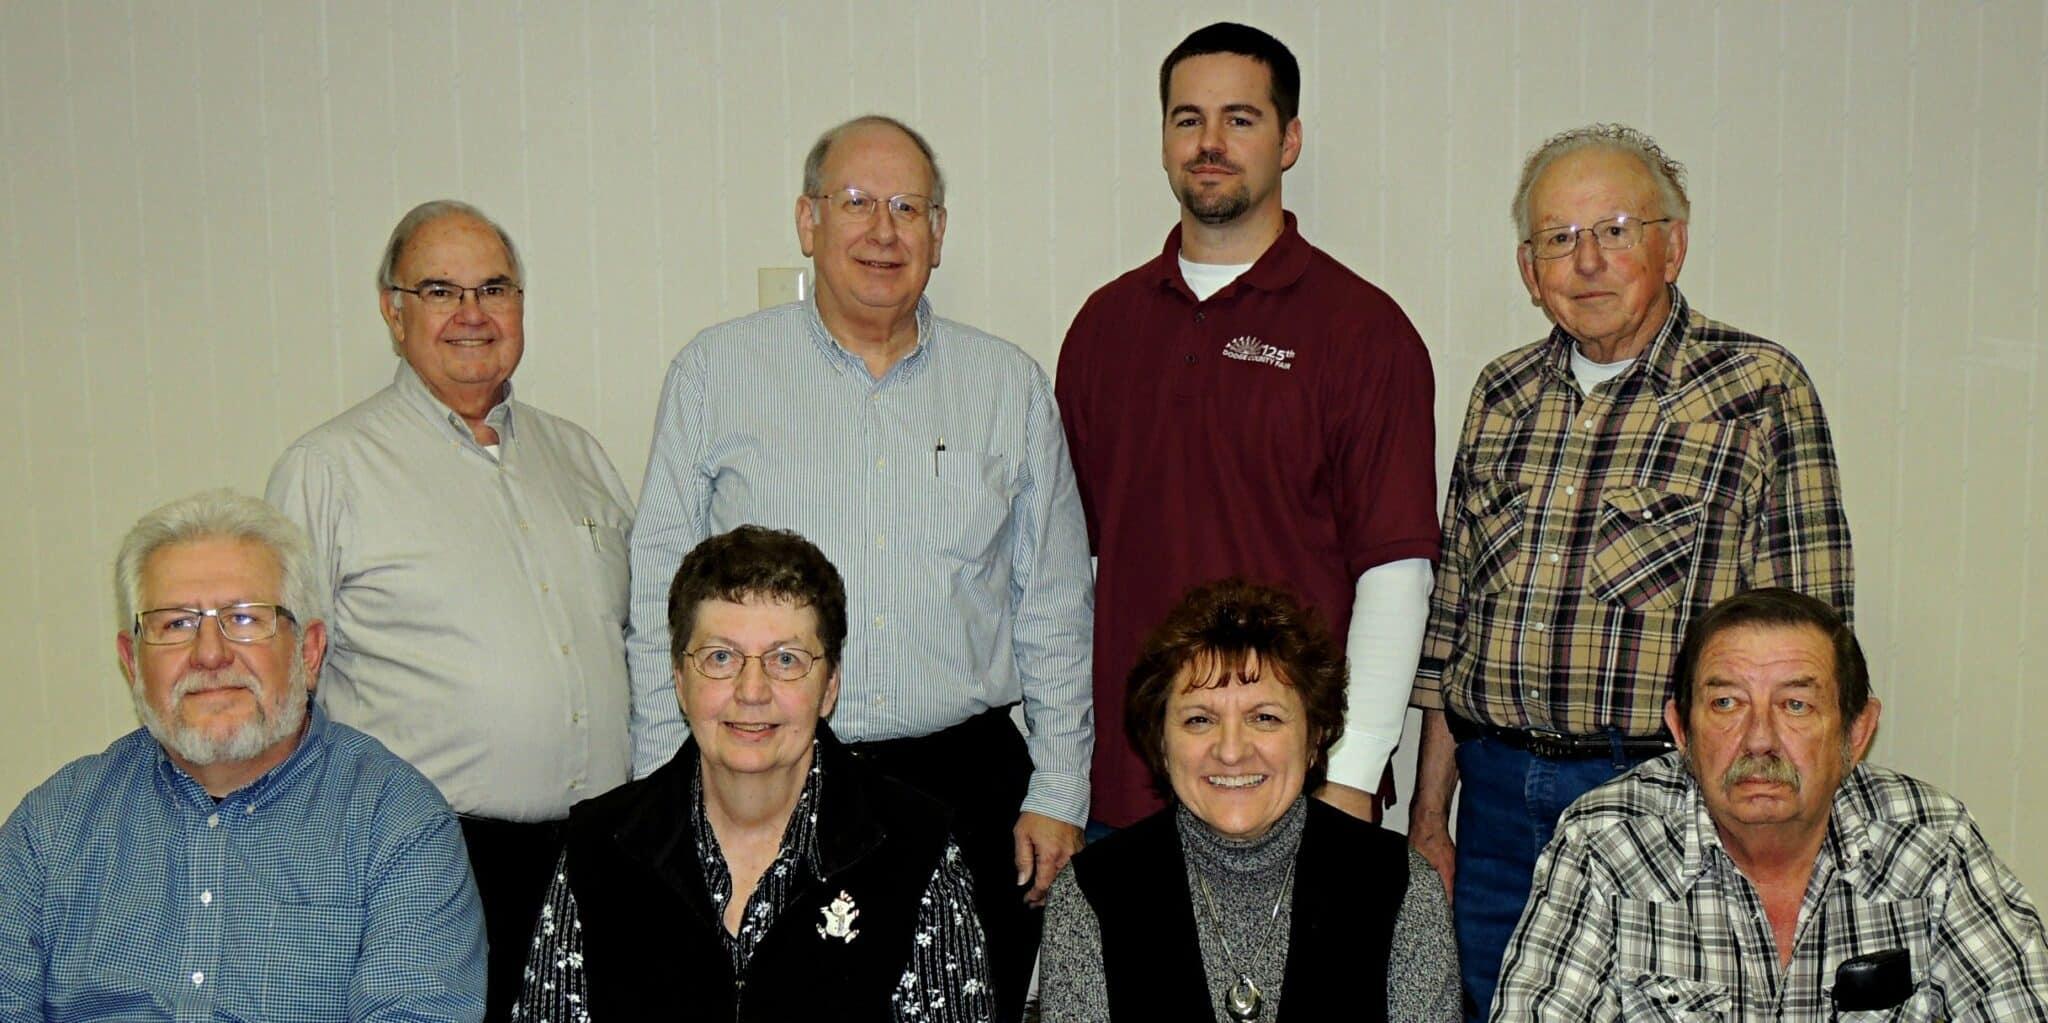 2013 Dodge County Fair Association Board of Directors